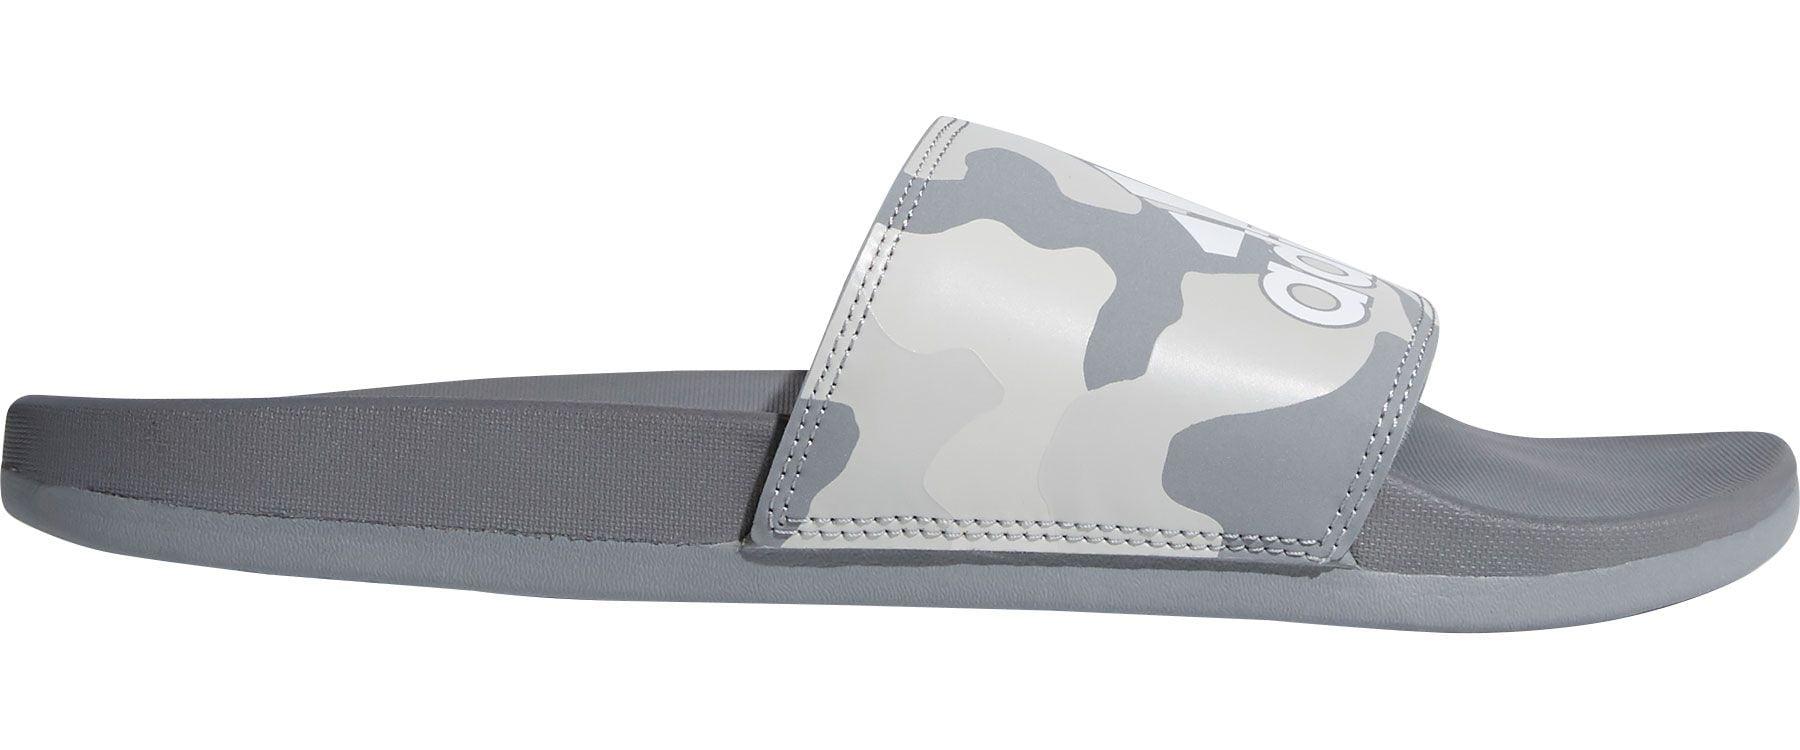 new styles 1926c 2bfc6 adidas Mens Adilette CloudFoam Plus Graphic Slides - Walmart